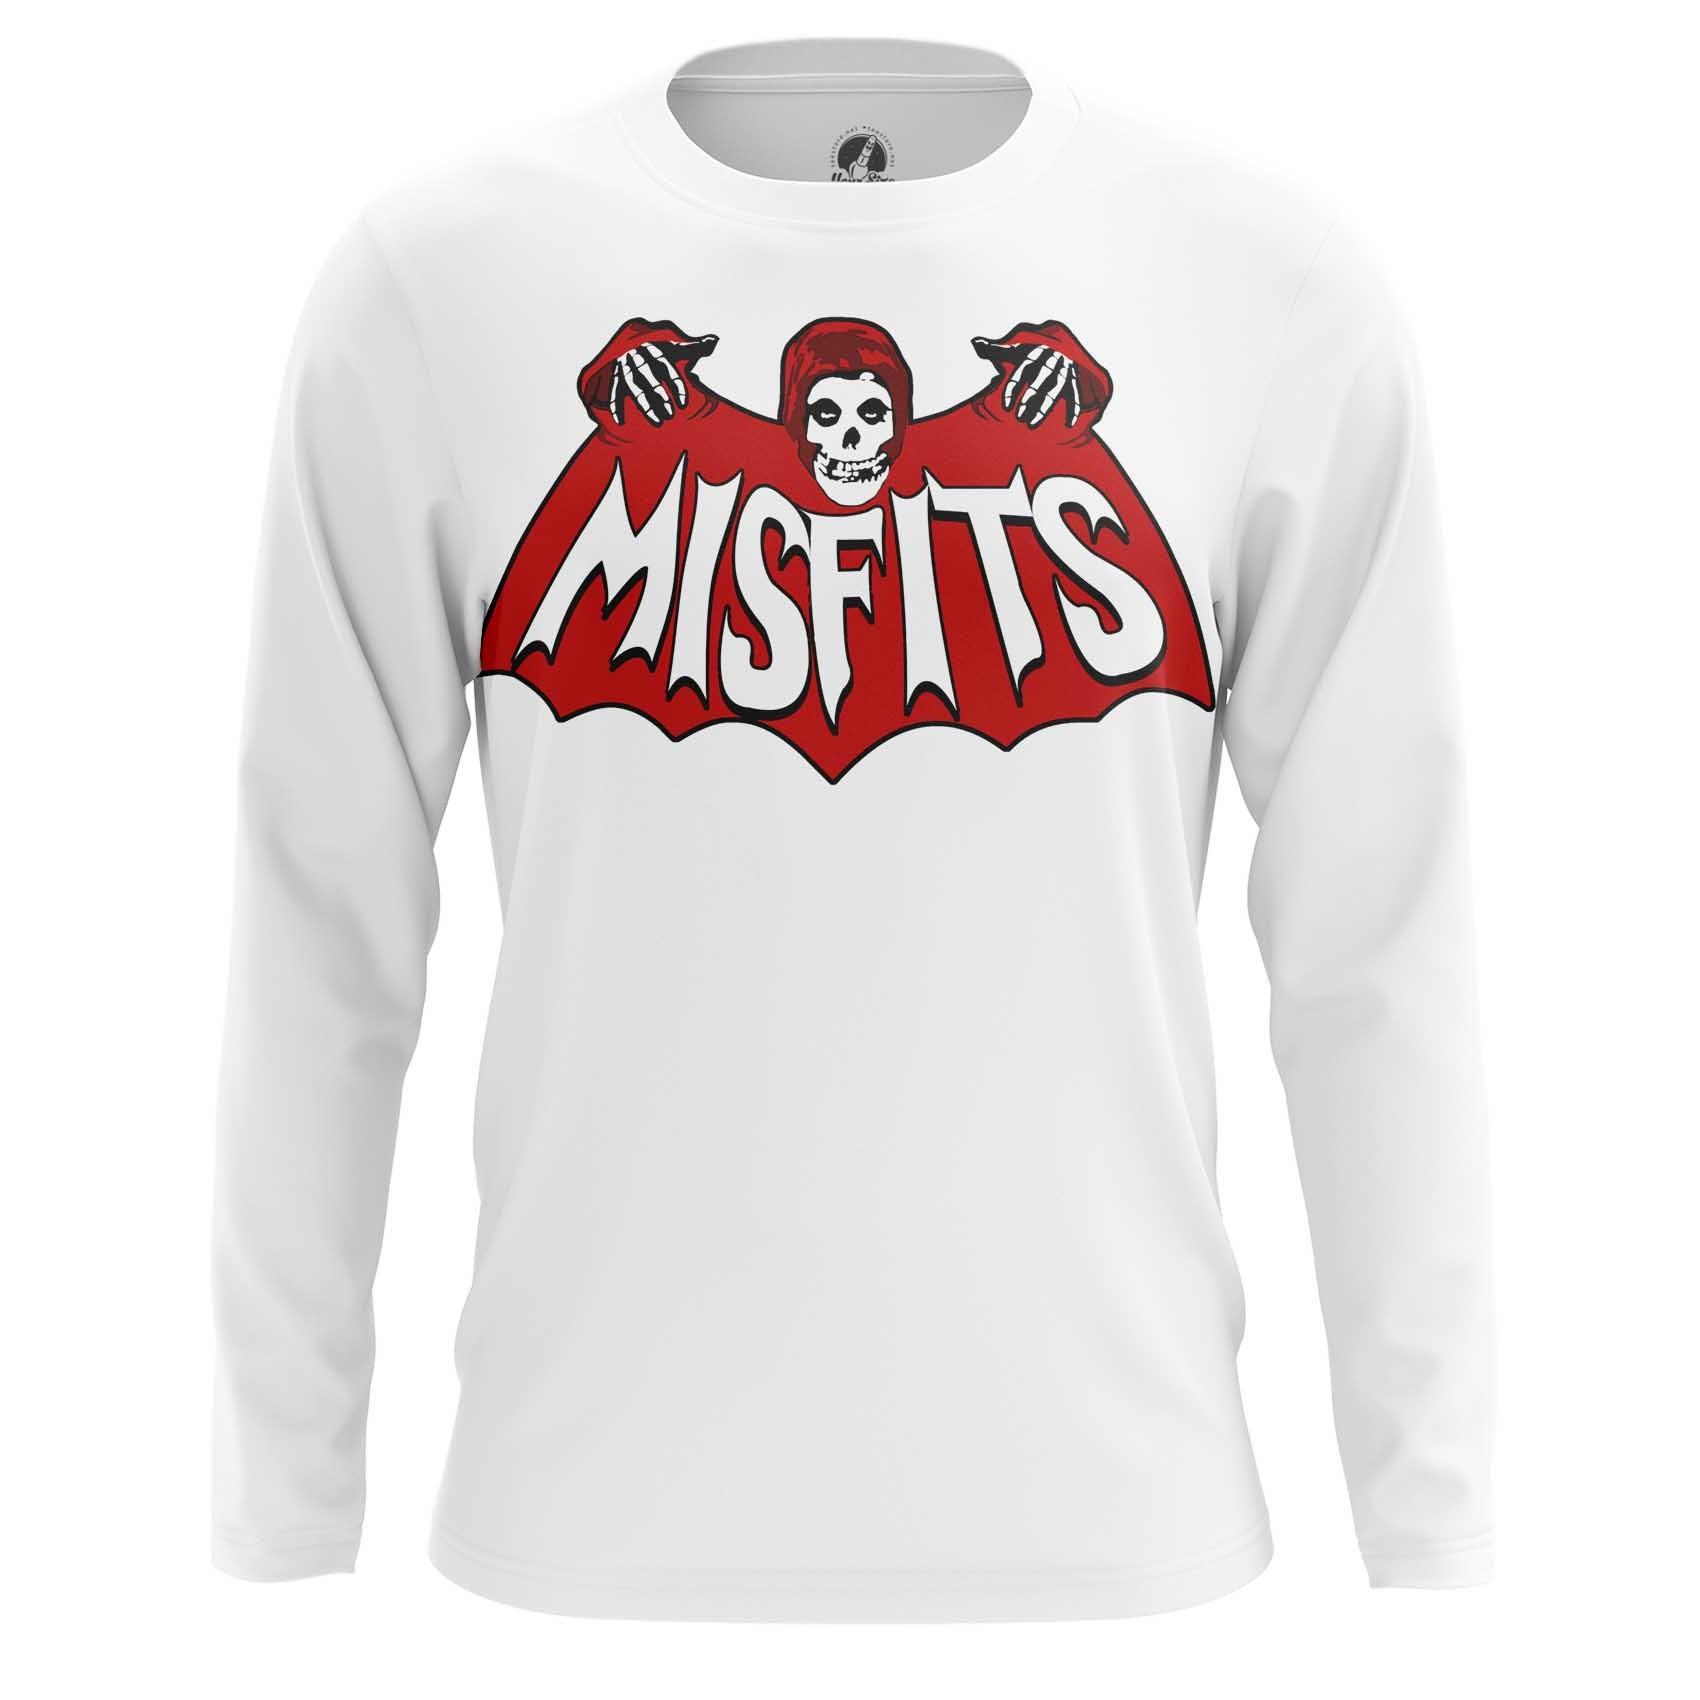 Merchandise Long Sleeve Misfits